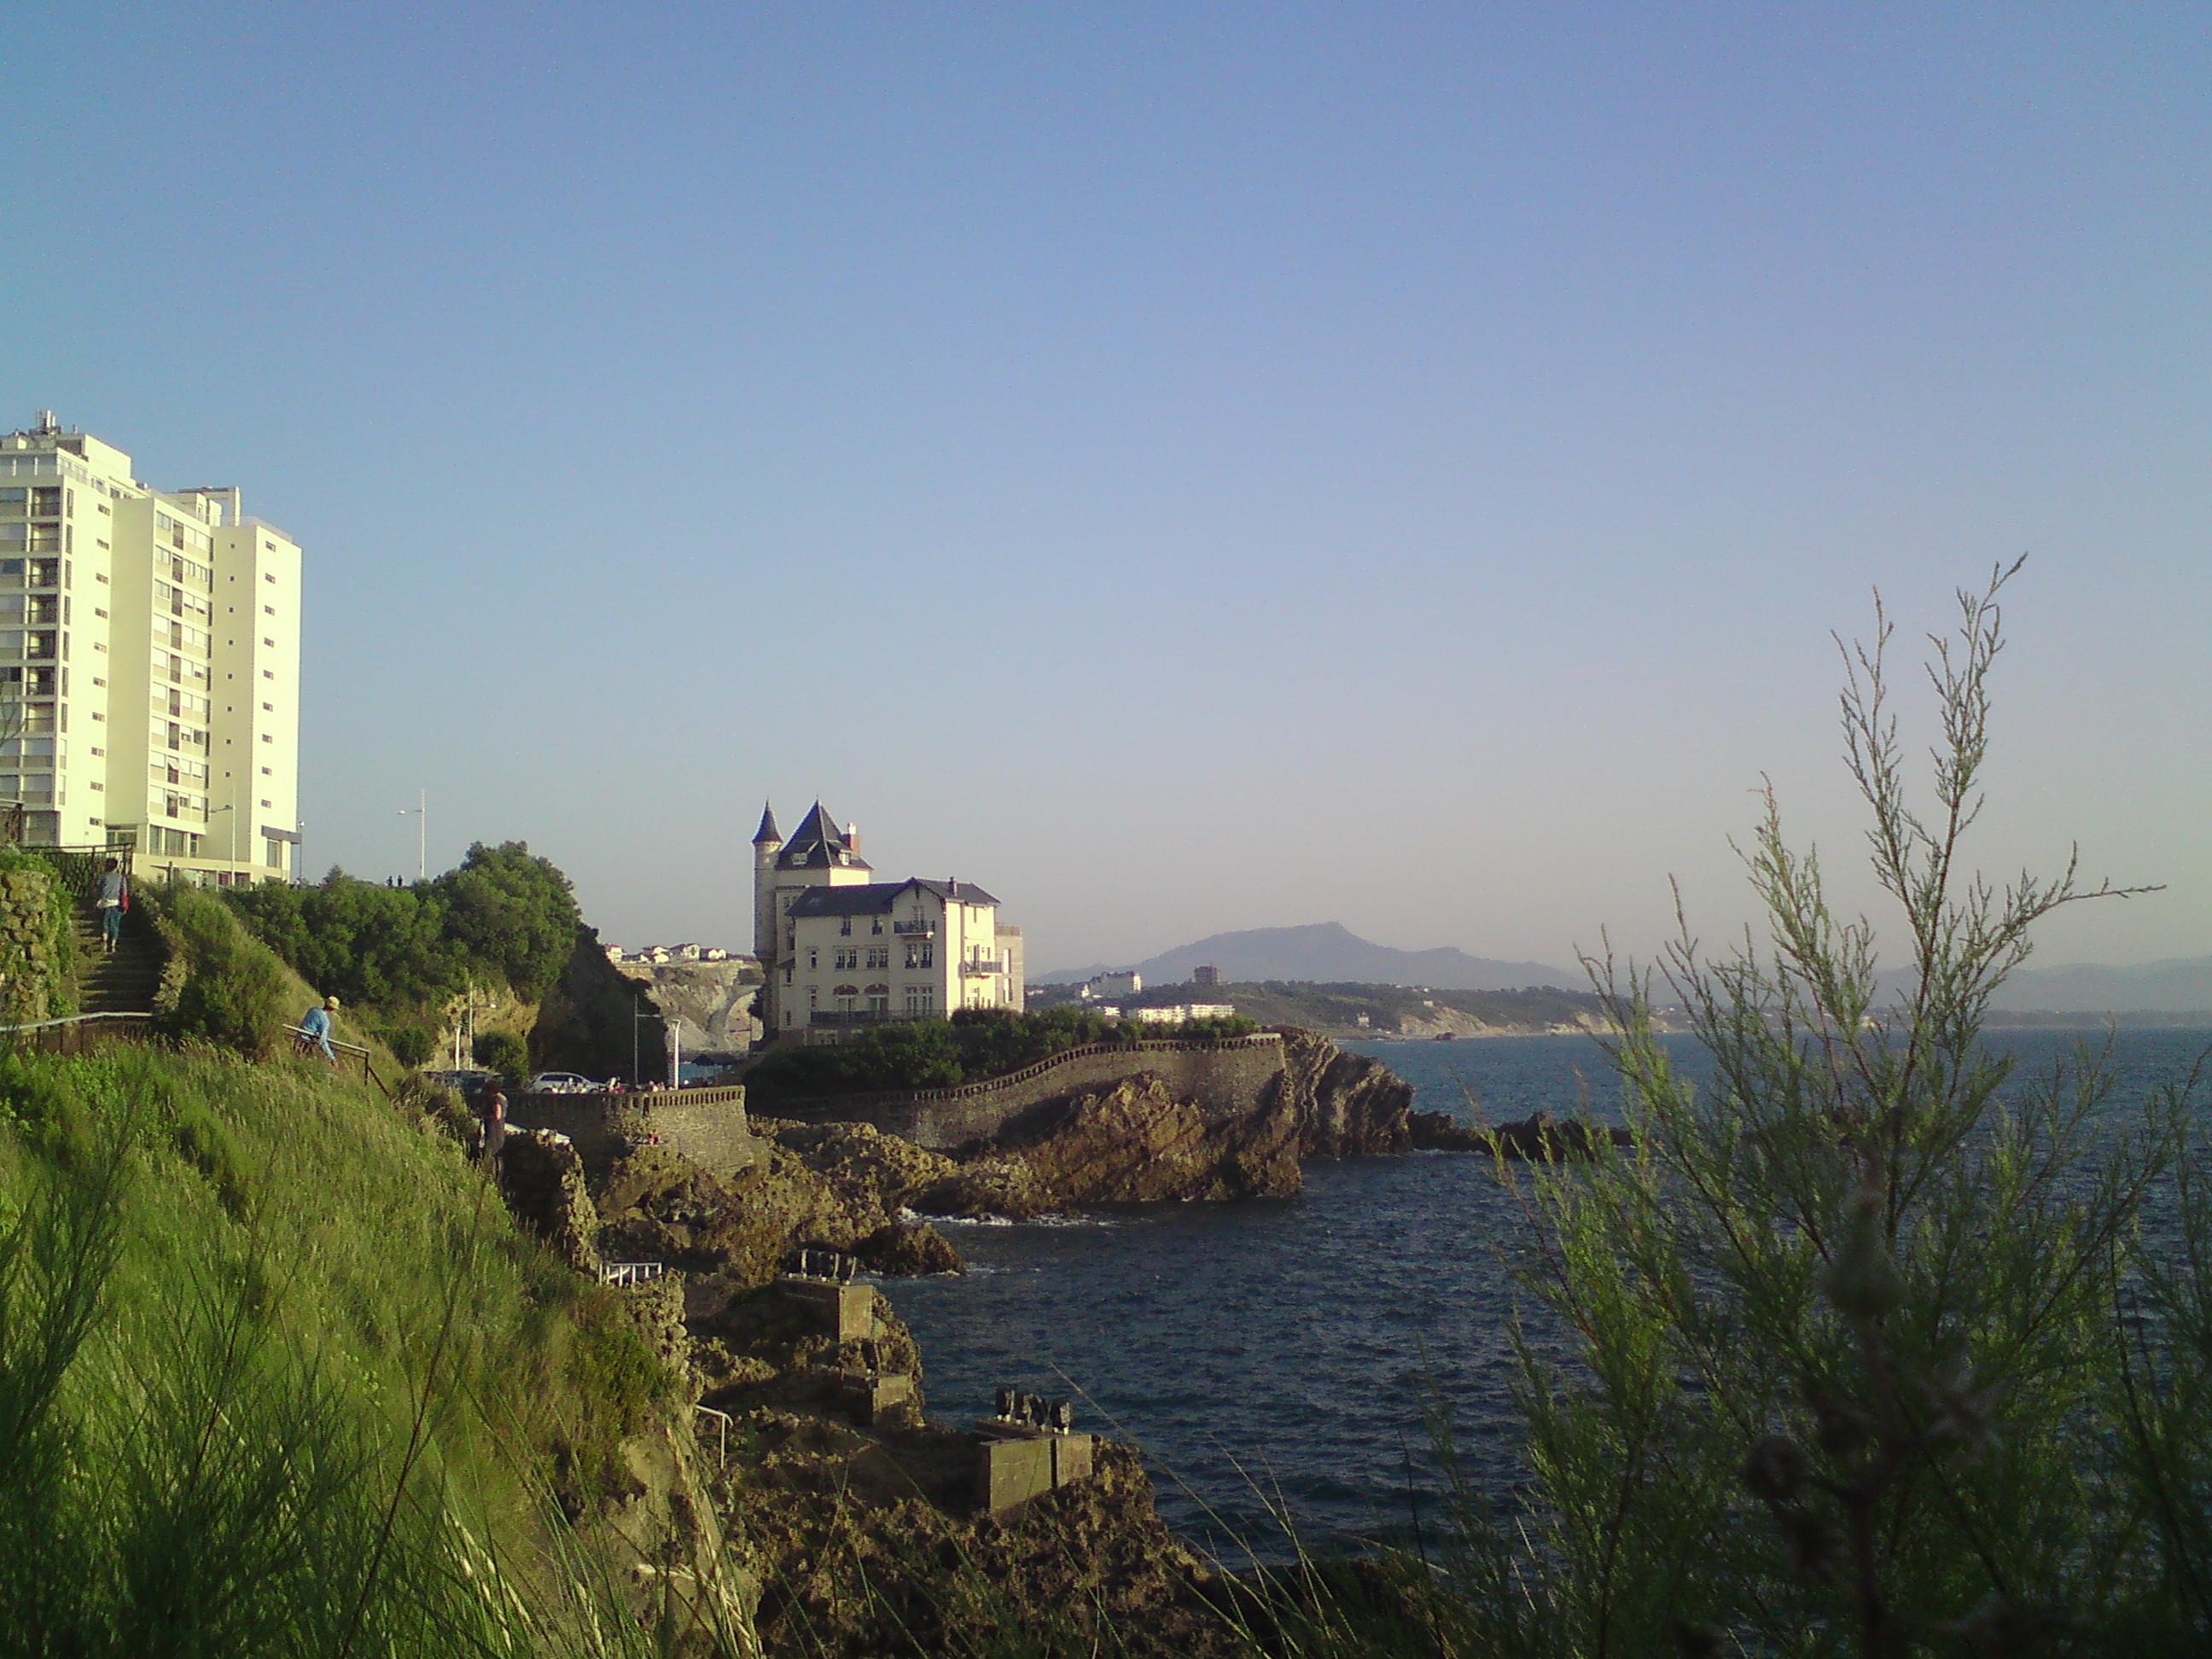 Biarritz diantara laut & pegunungan